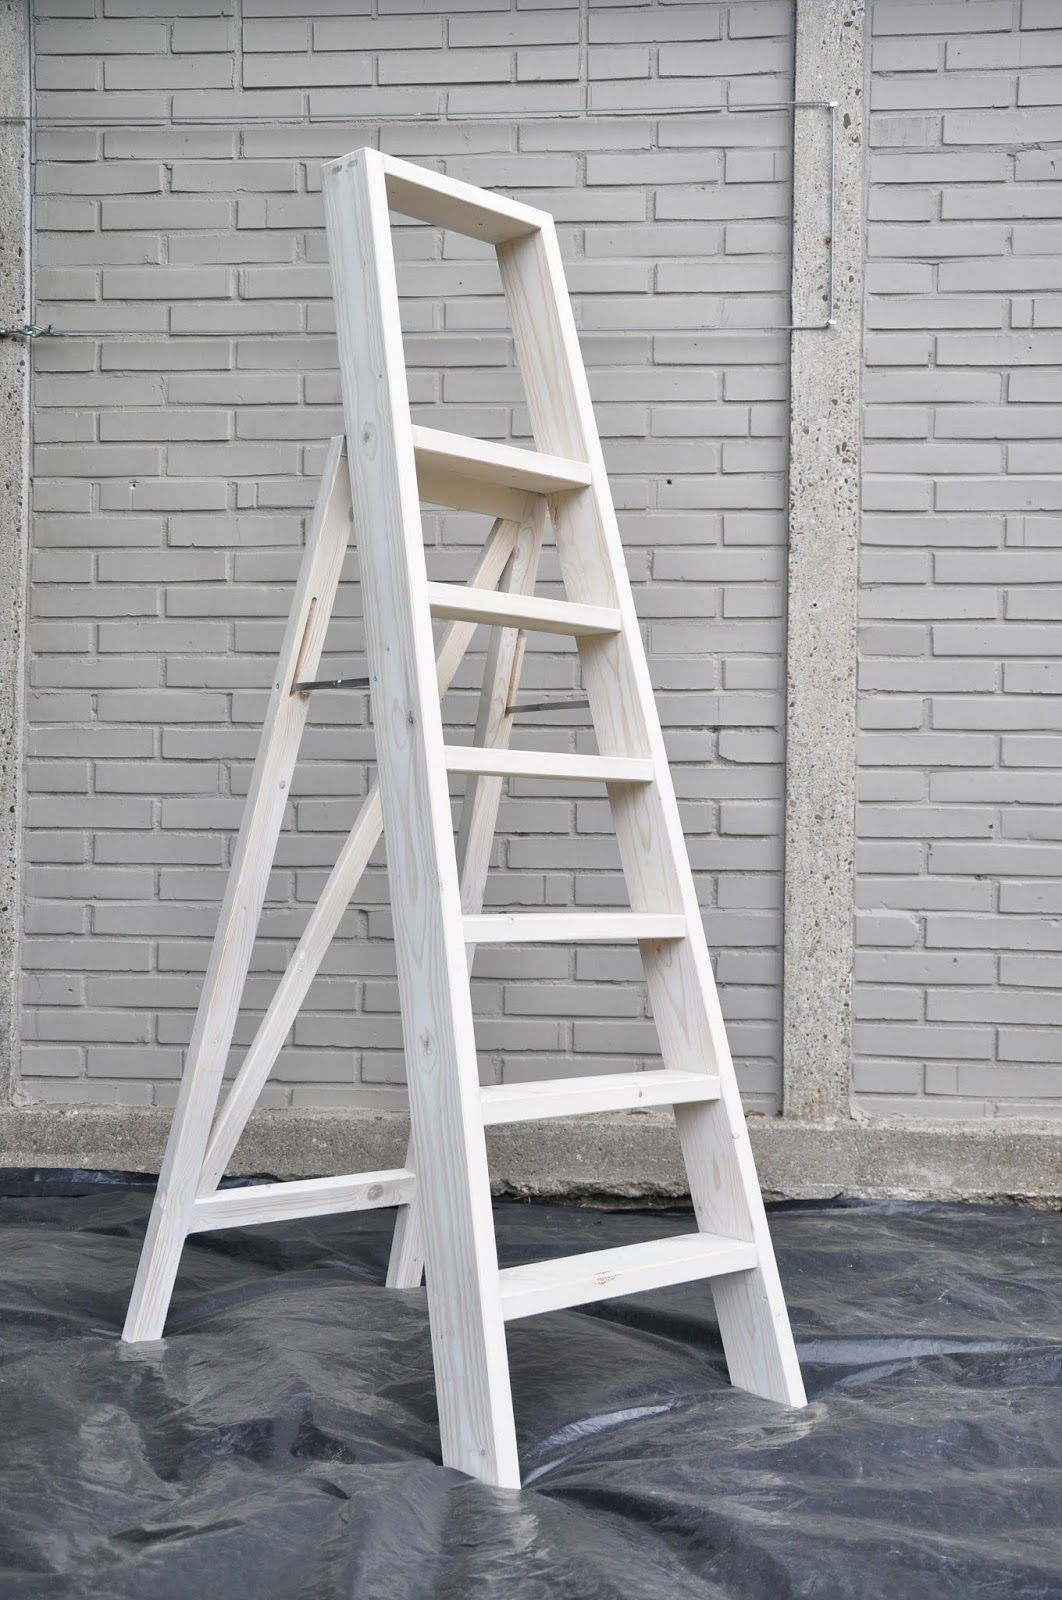 Voorkeur laddertjes.net #FV69